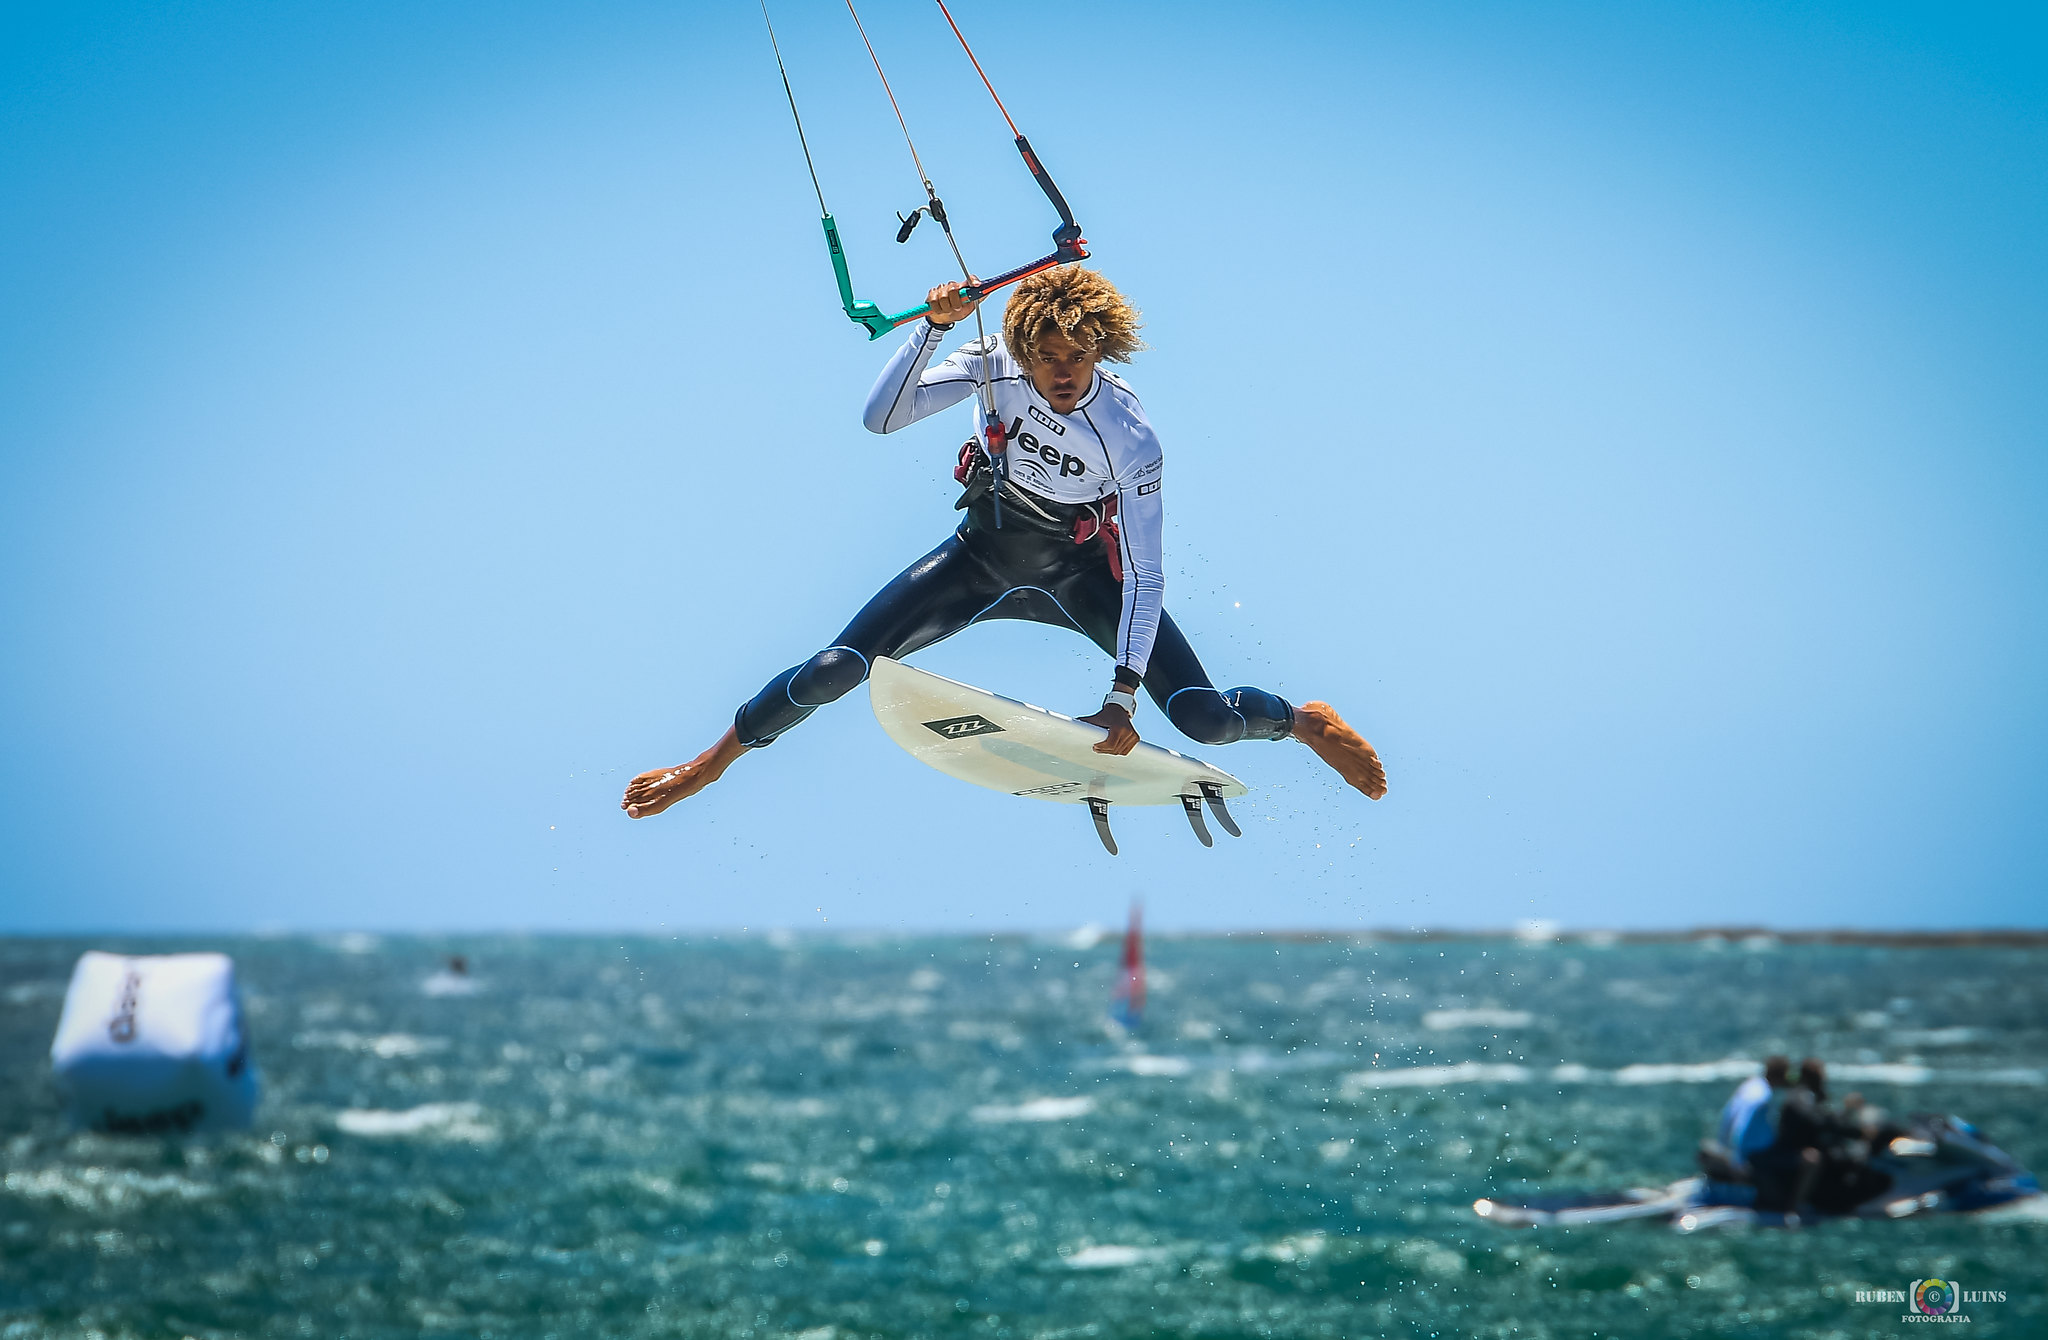 kitesurf strapless